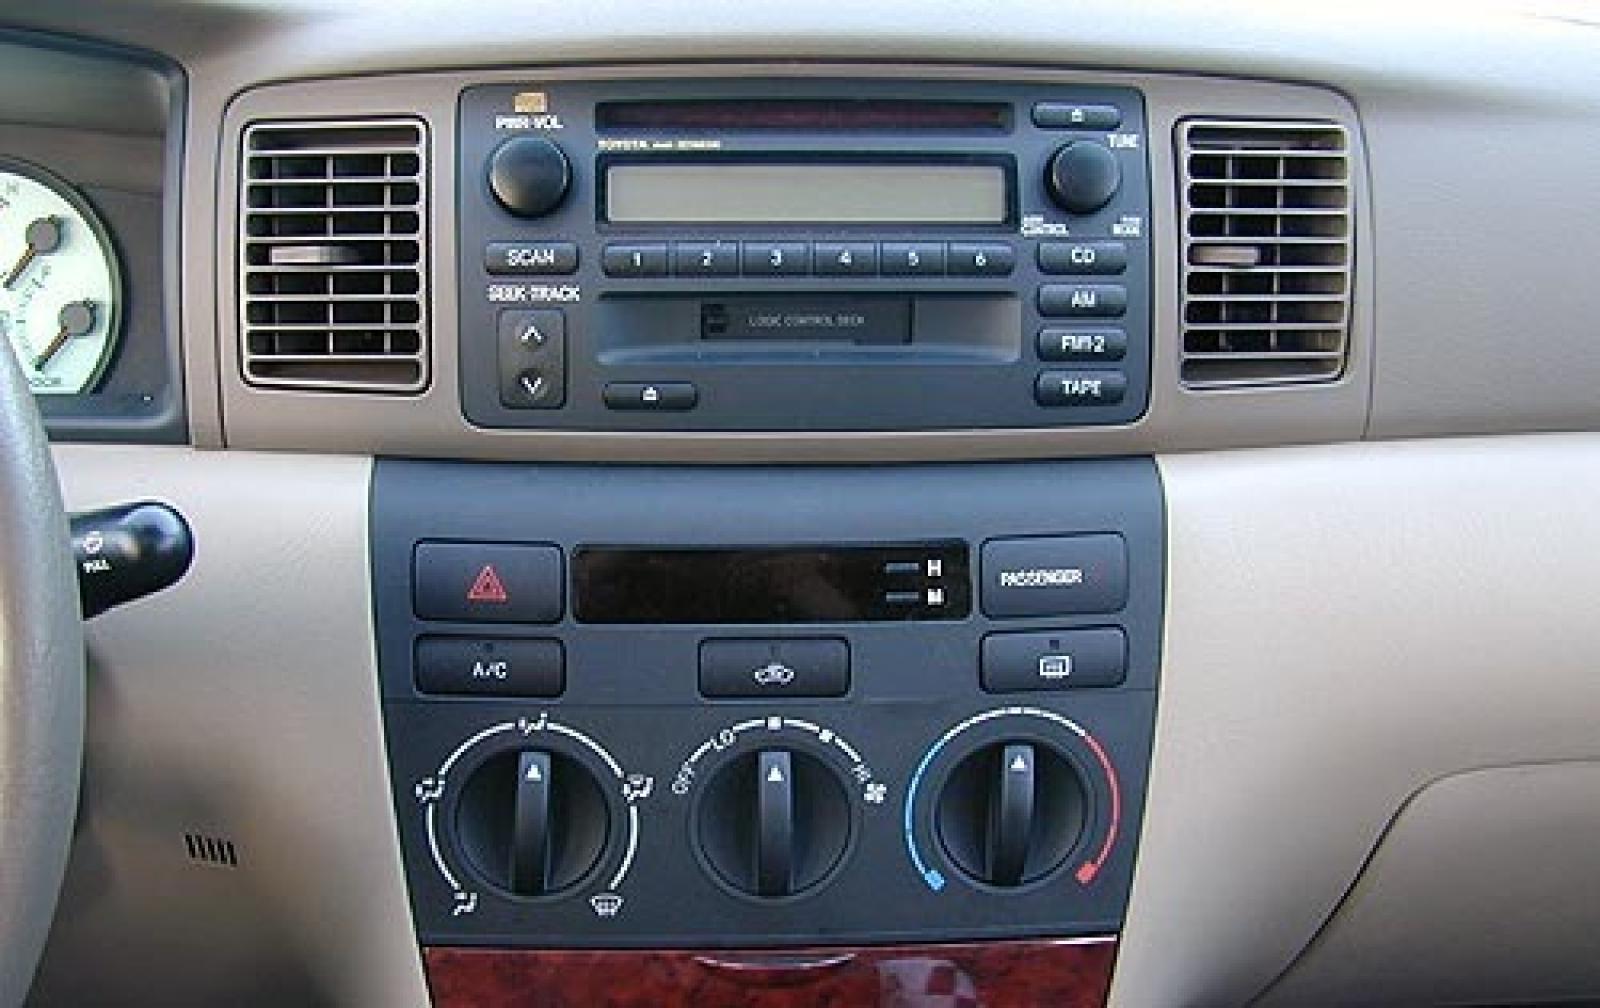 2004 Toyota Corolla #1 800 1024 1280 1600 origin